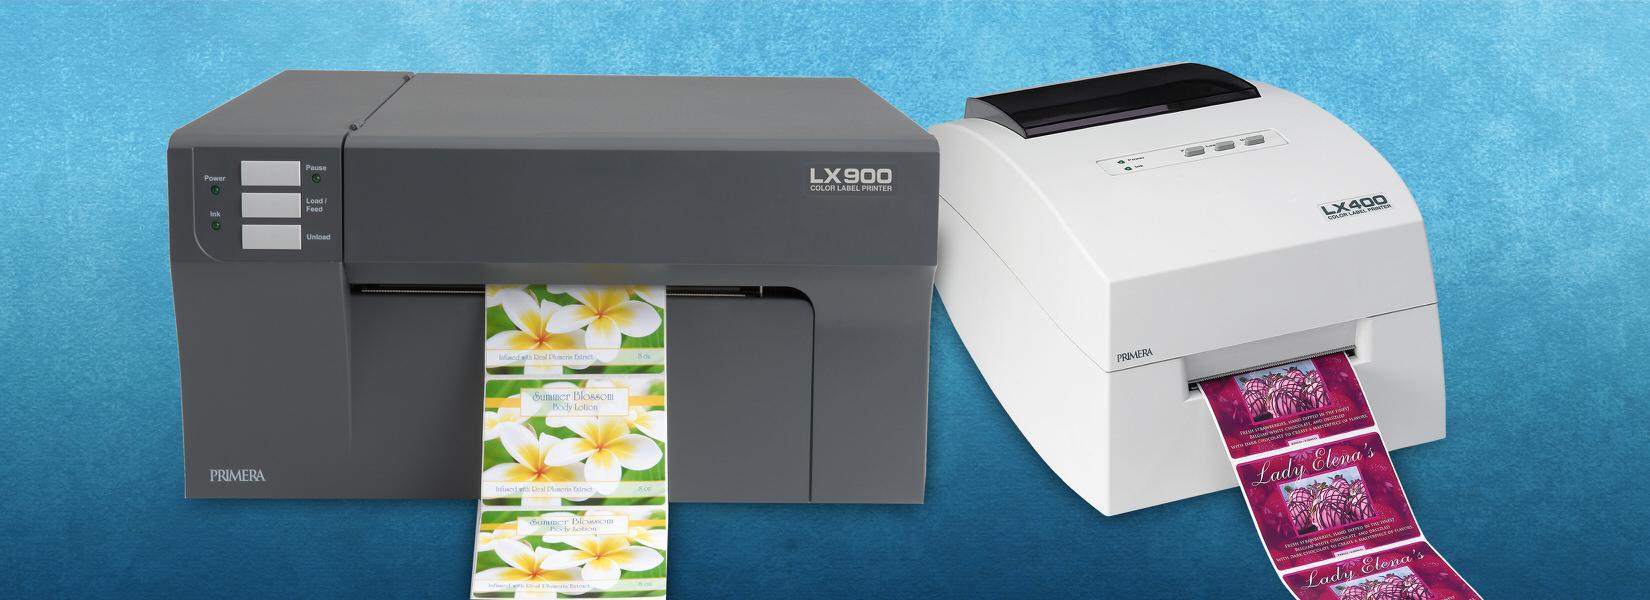 Color printer label - Label Printers